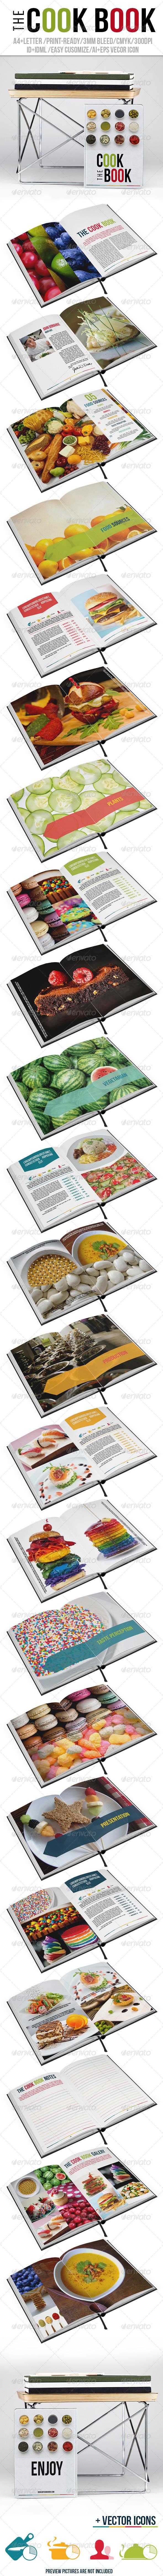 The Cook Book - Brochures Print Templates